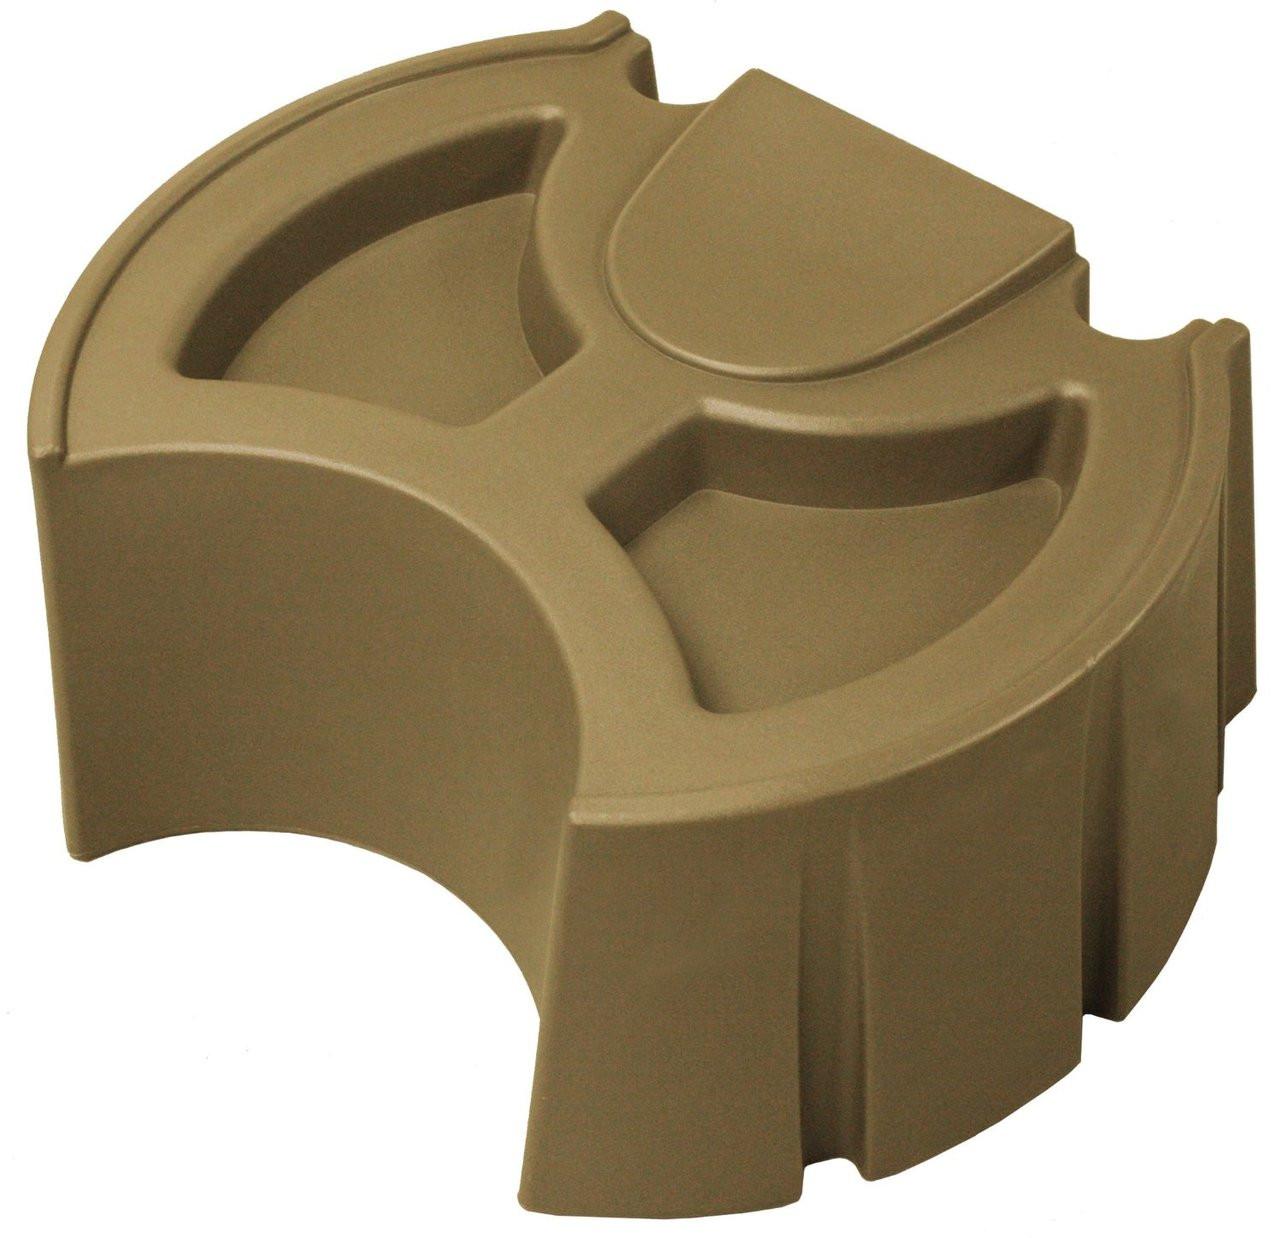 40 Gallon Flat Back - Rain Barrel - Good Ideas - KHAKI w/ Stand